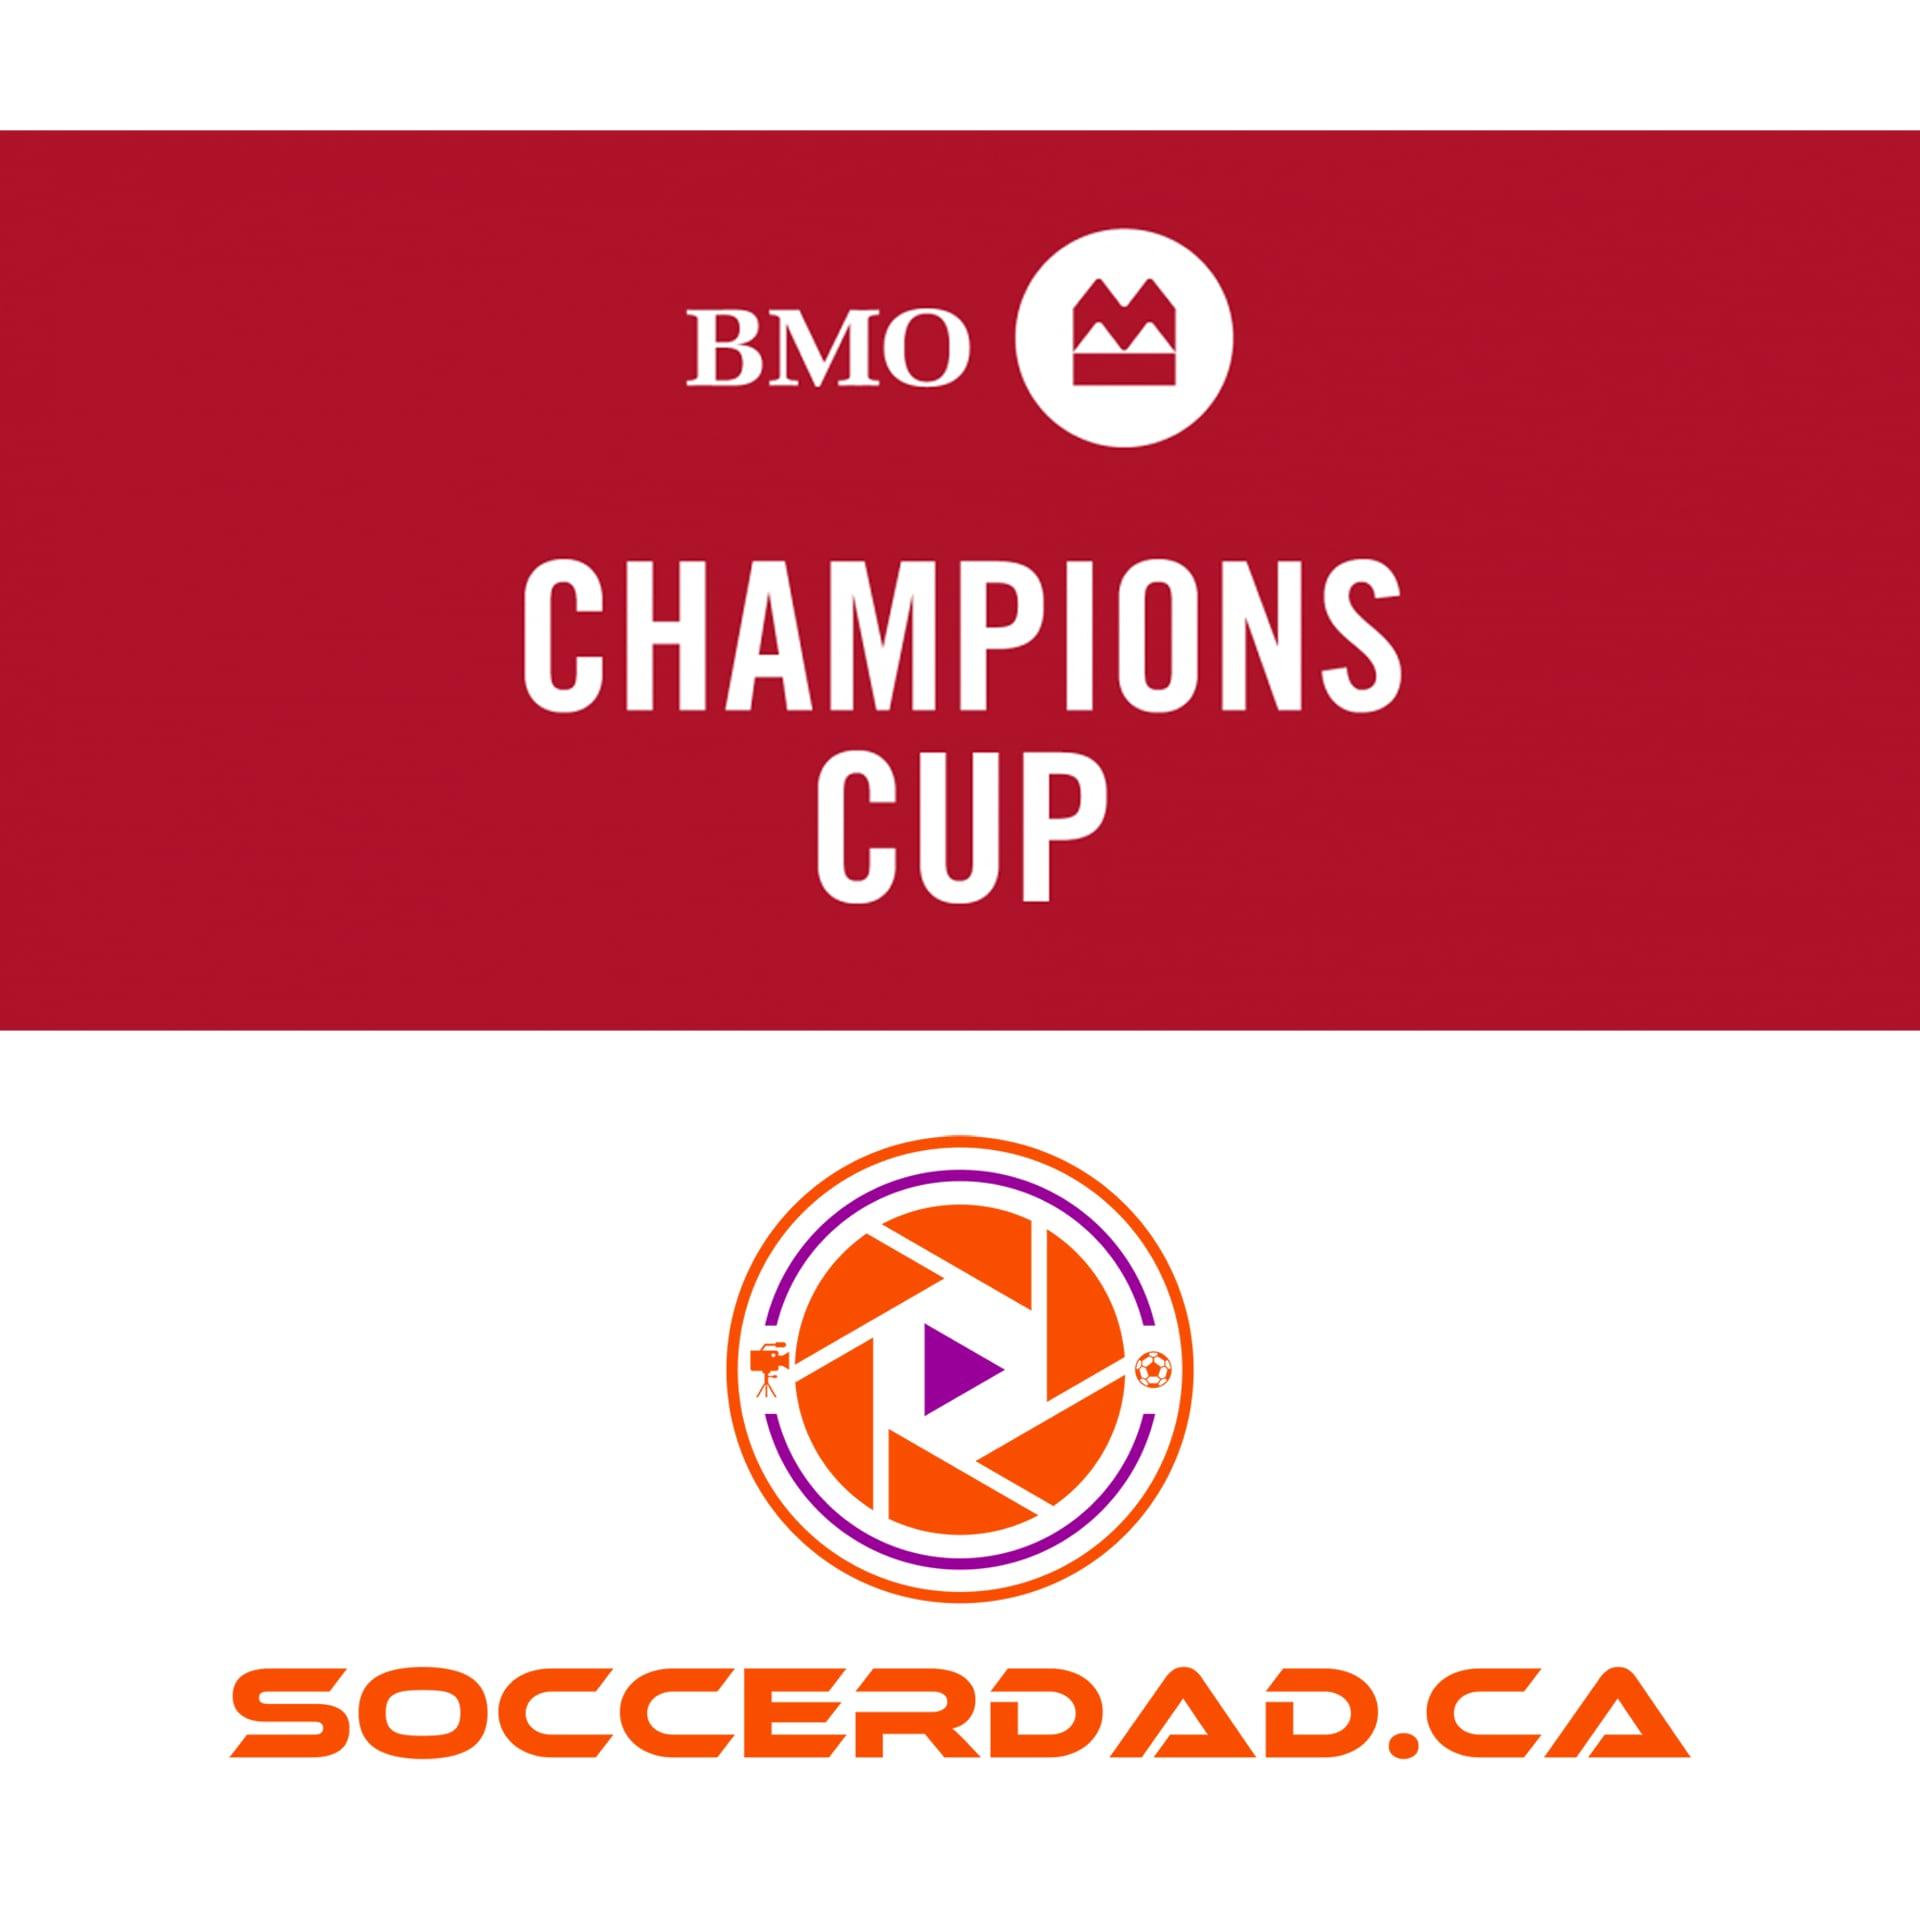 2017 BMO Champions Cup